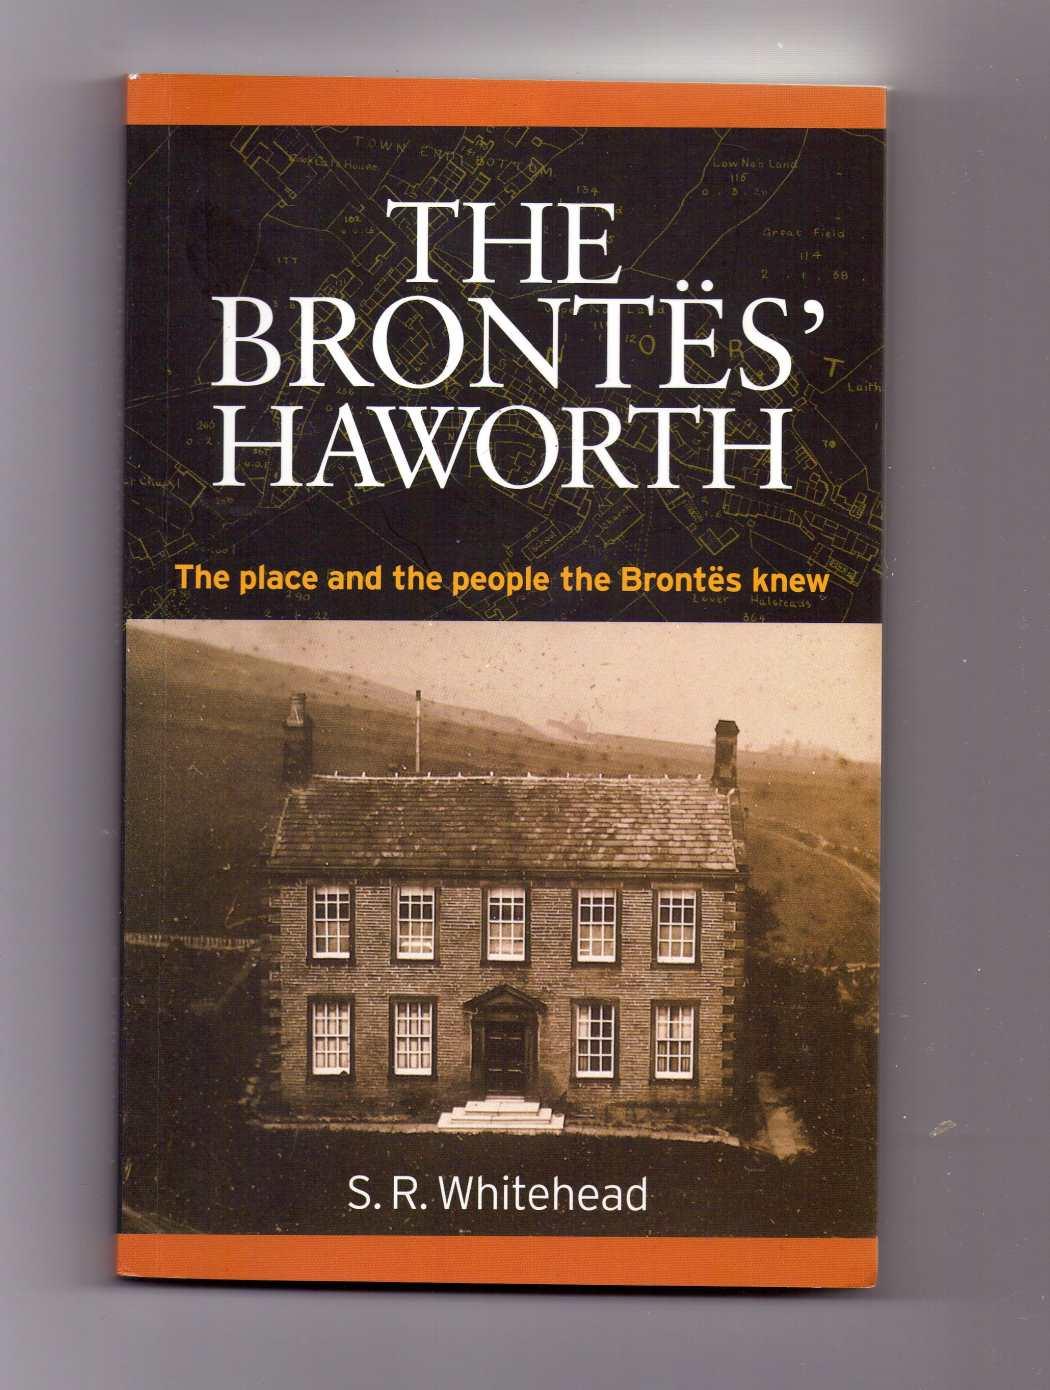 bronte-haworth-book